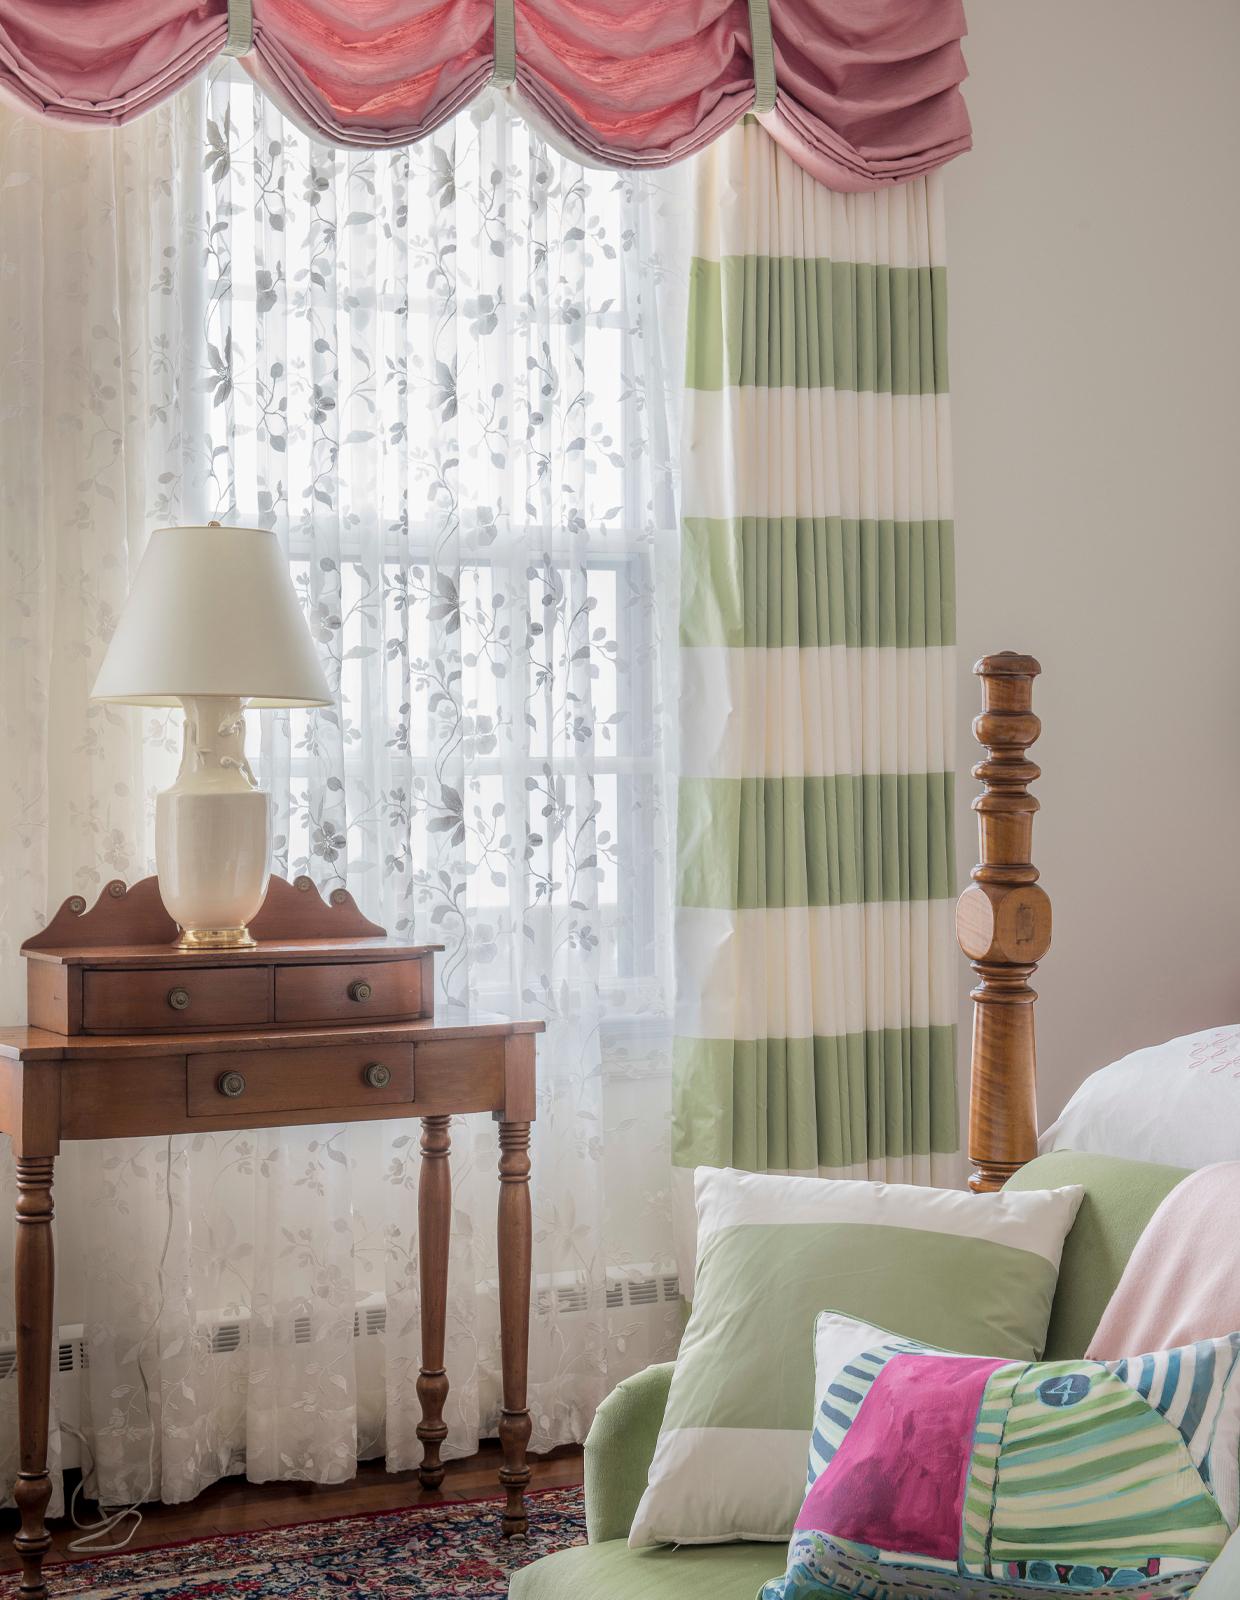 kim kirby bedroom interior design